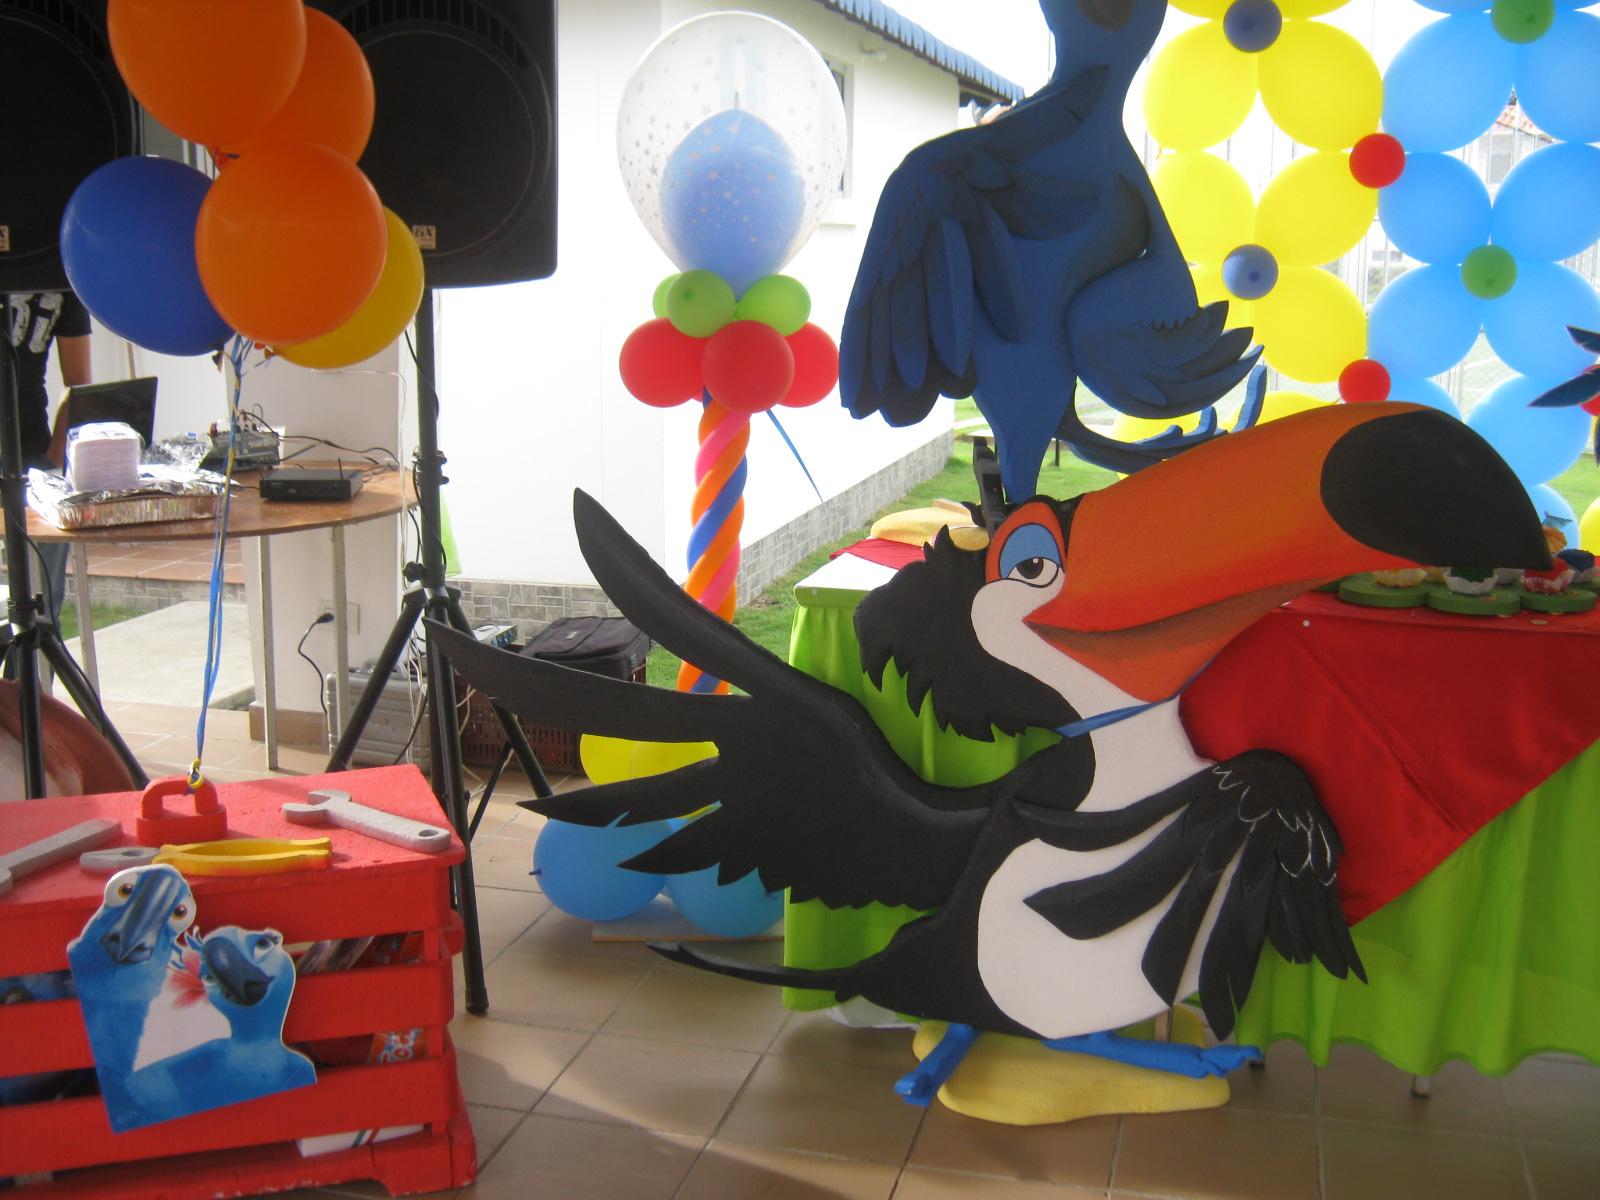 Decoracion Hawaiana Manualidades ~ Ideas Para Decorar Fiestas Infantiles Cumplea Os Muy